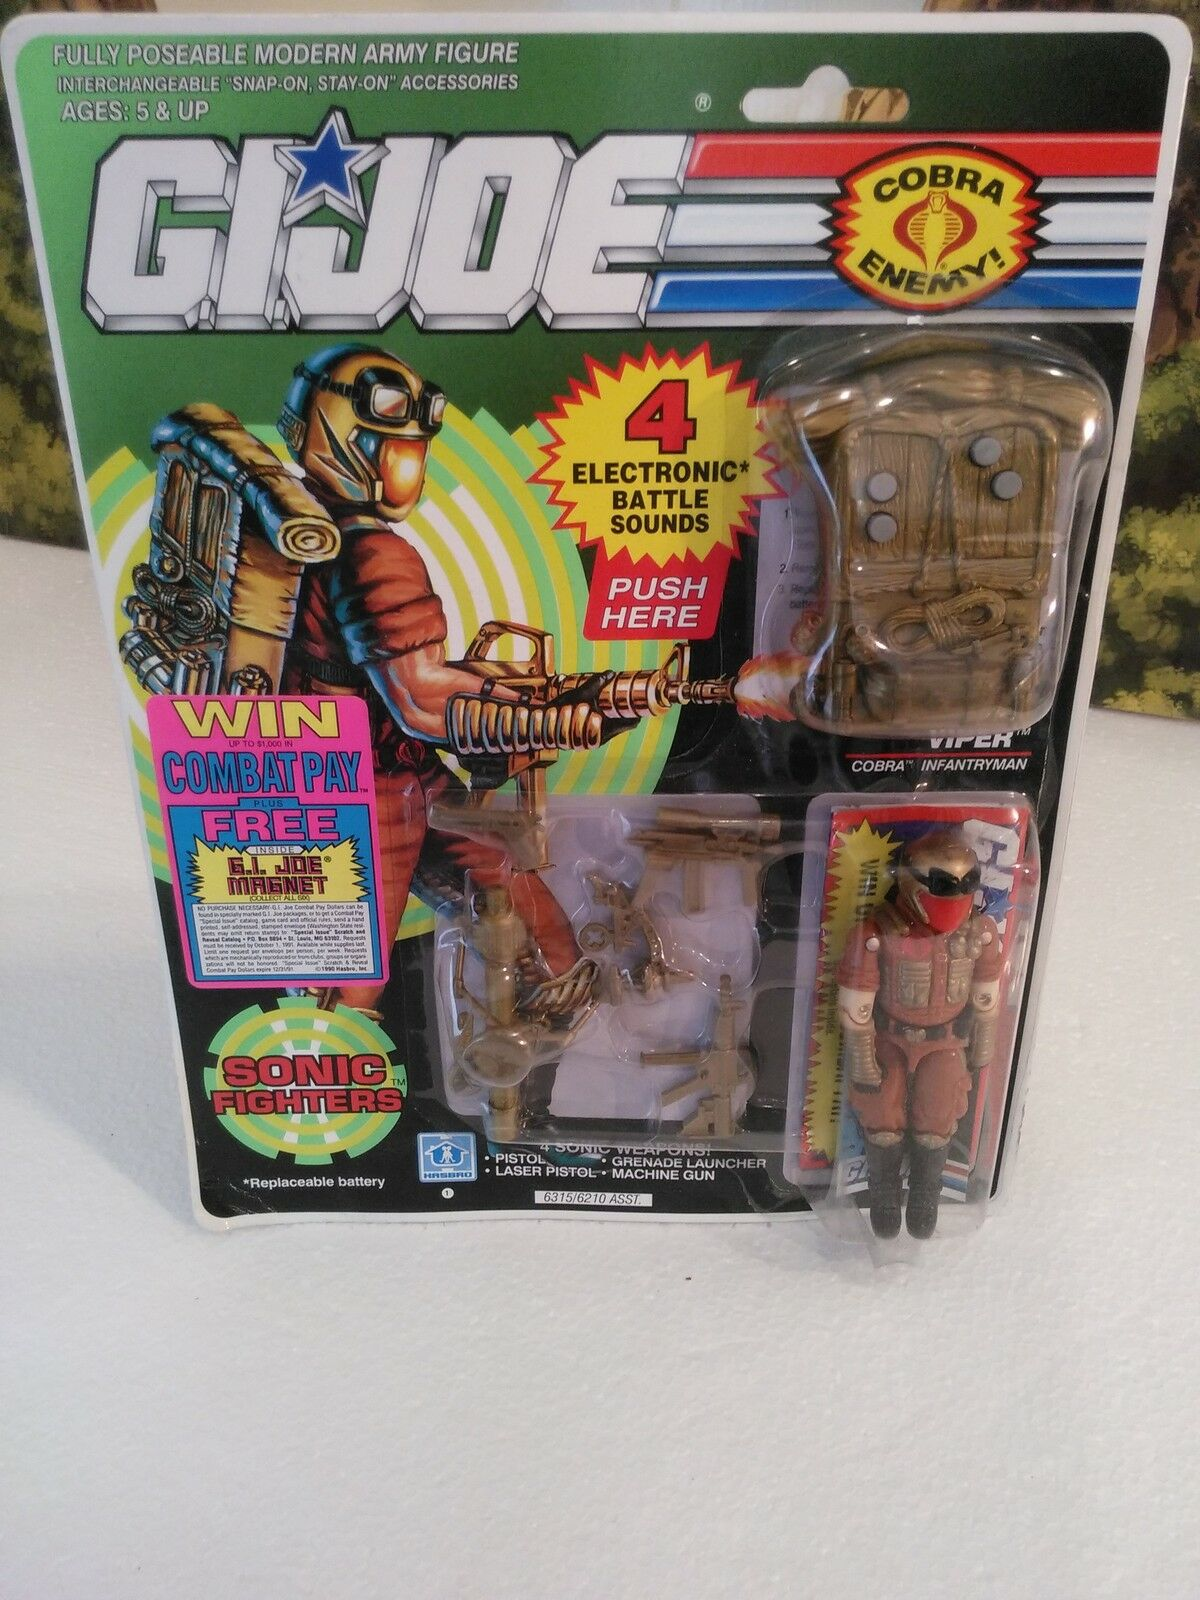 Sonic Fighters: 1990 Cobra Infantryman: COBRA VIPER(v3):100% CMP/MOC